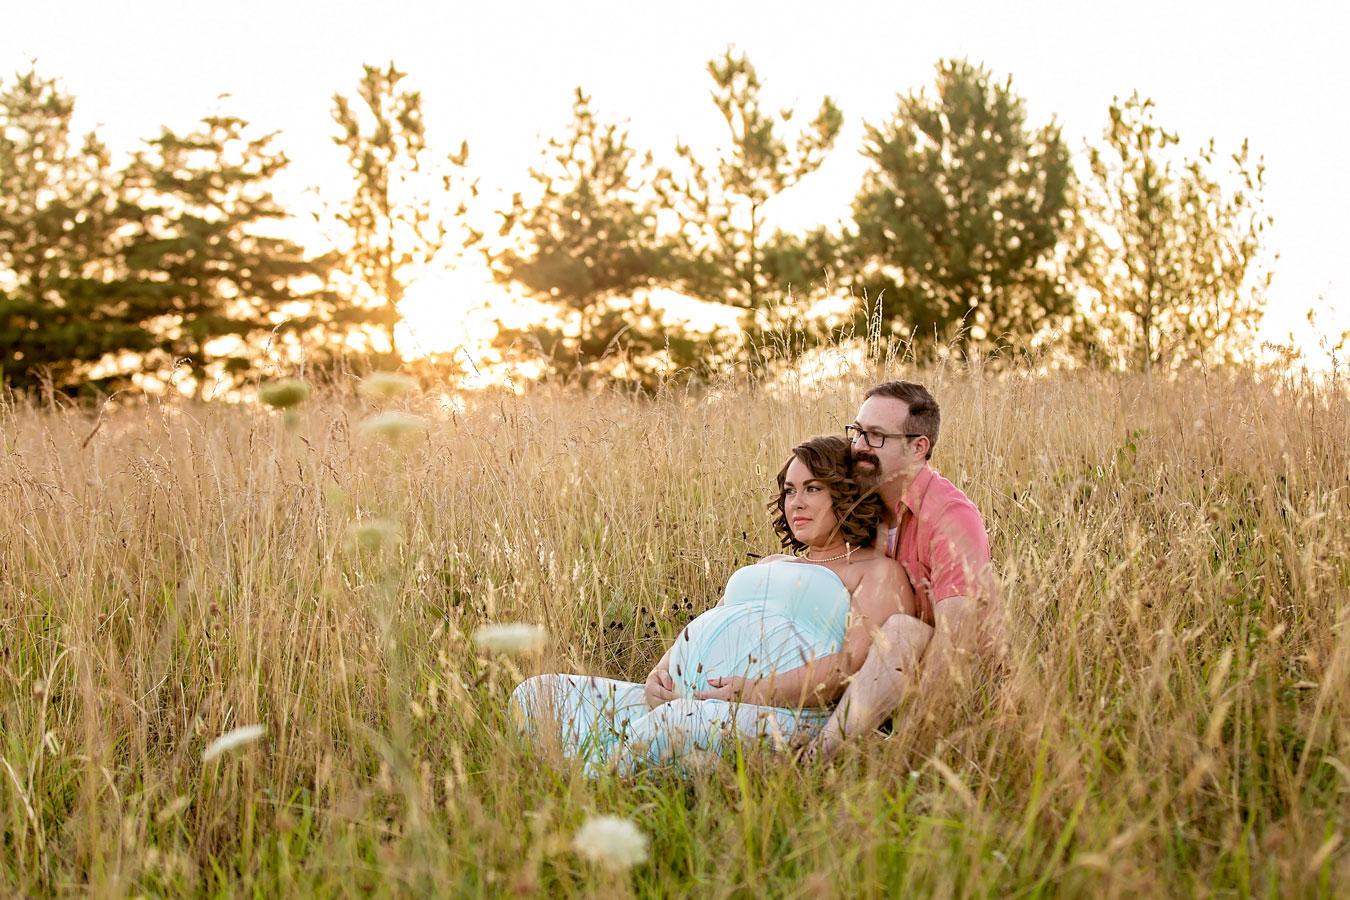 golde-grassy-field-knoxville-maternity-location.jpg